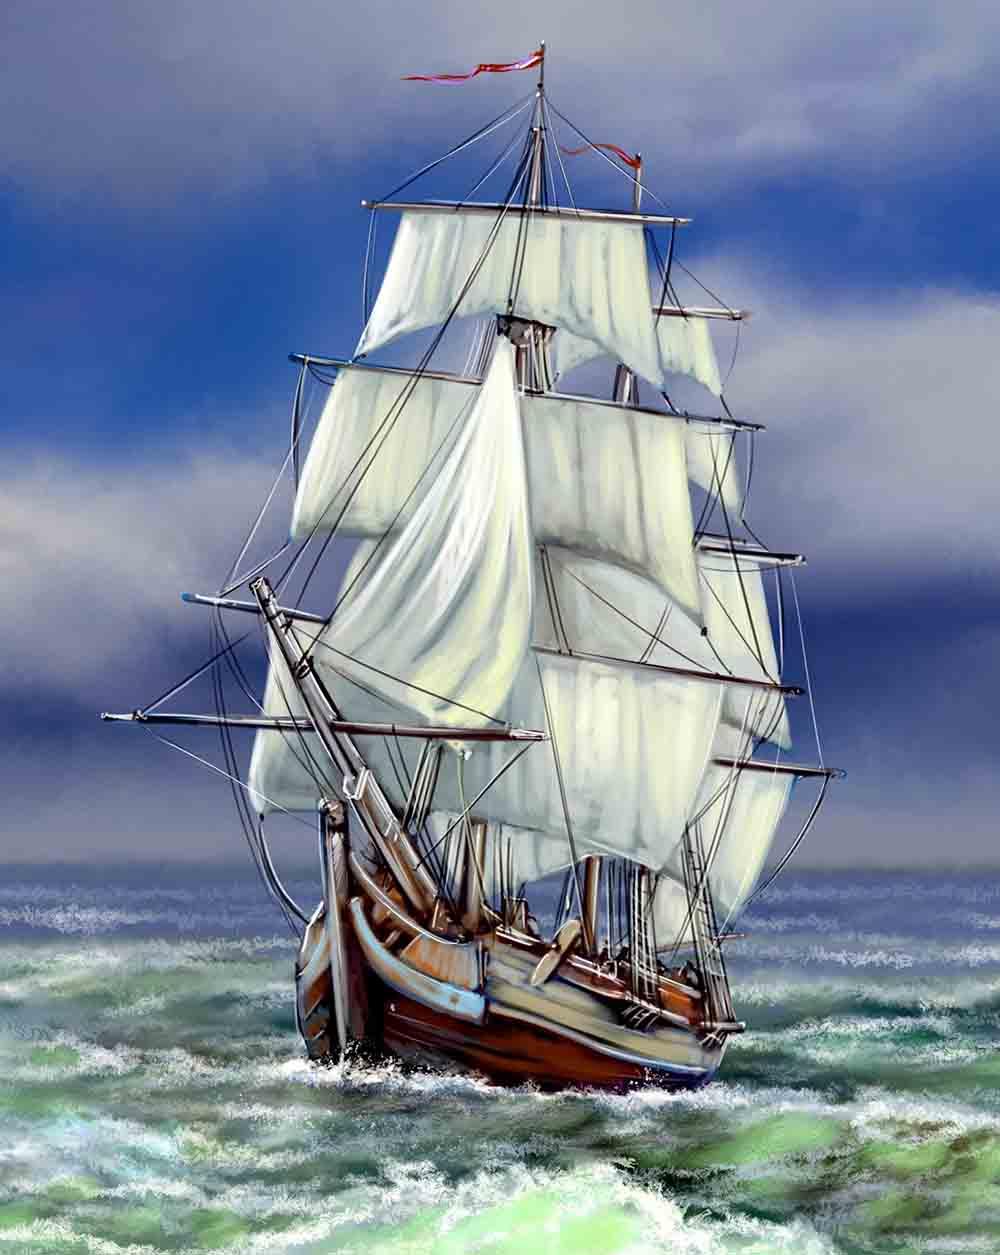 Холст с красками 17х22 по номер. в кор. (14цв.) Корабль в волнующемся море (Арт. ХК-8168)